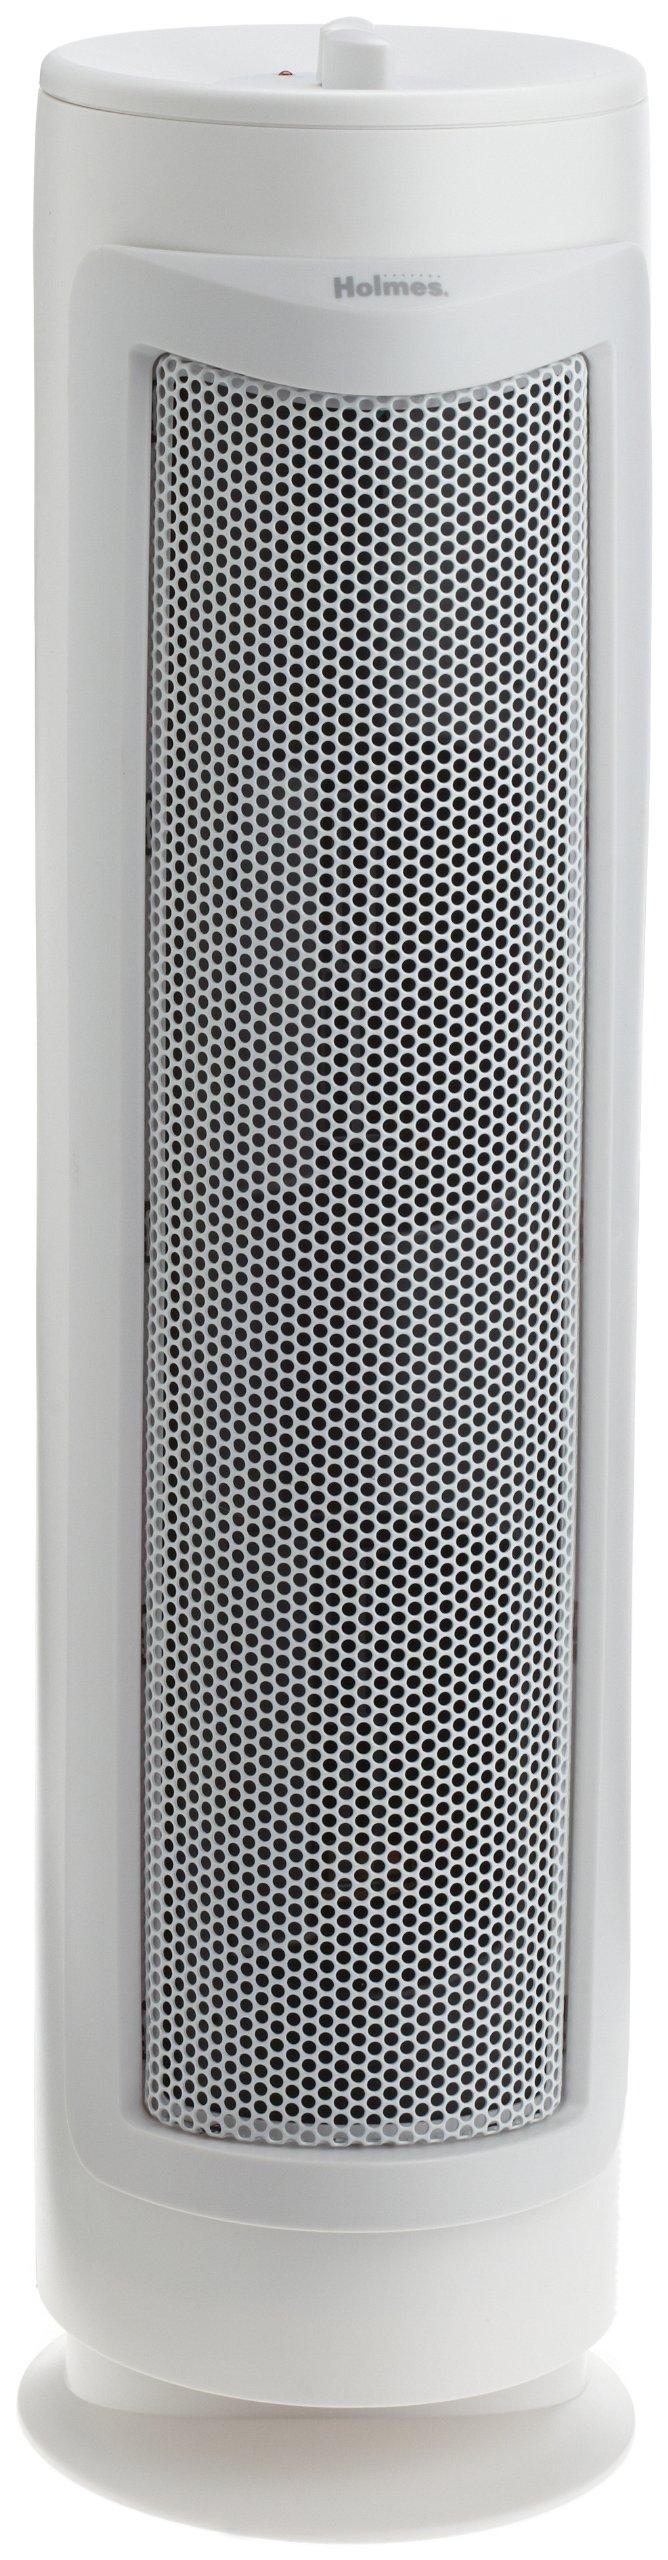 Holmes True HEPA 3 Speed Tower Allergen Remover, HAP716-U